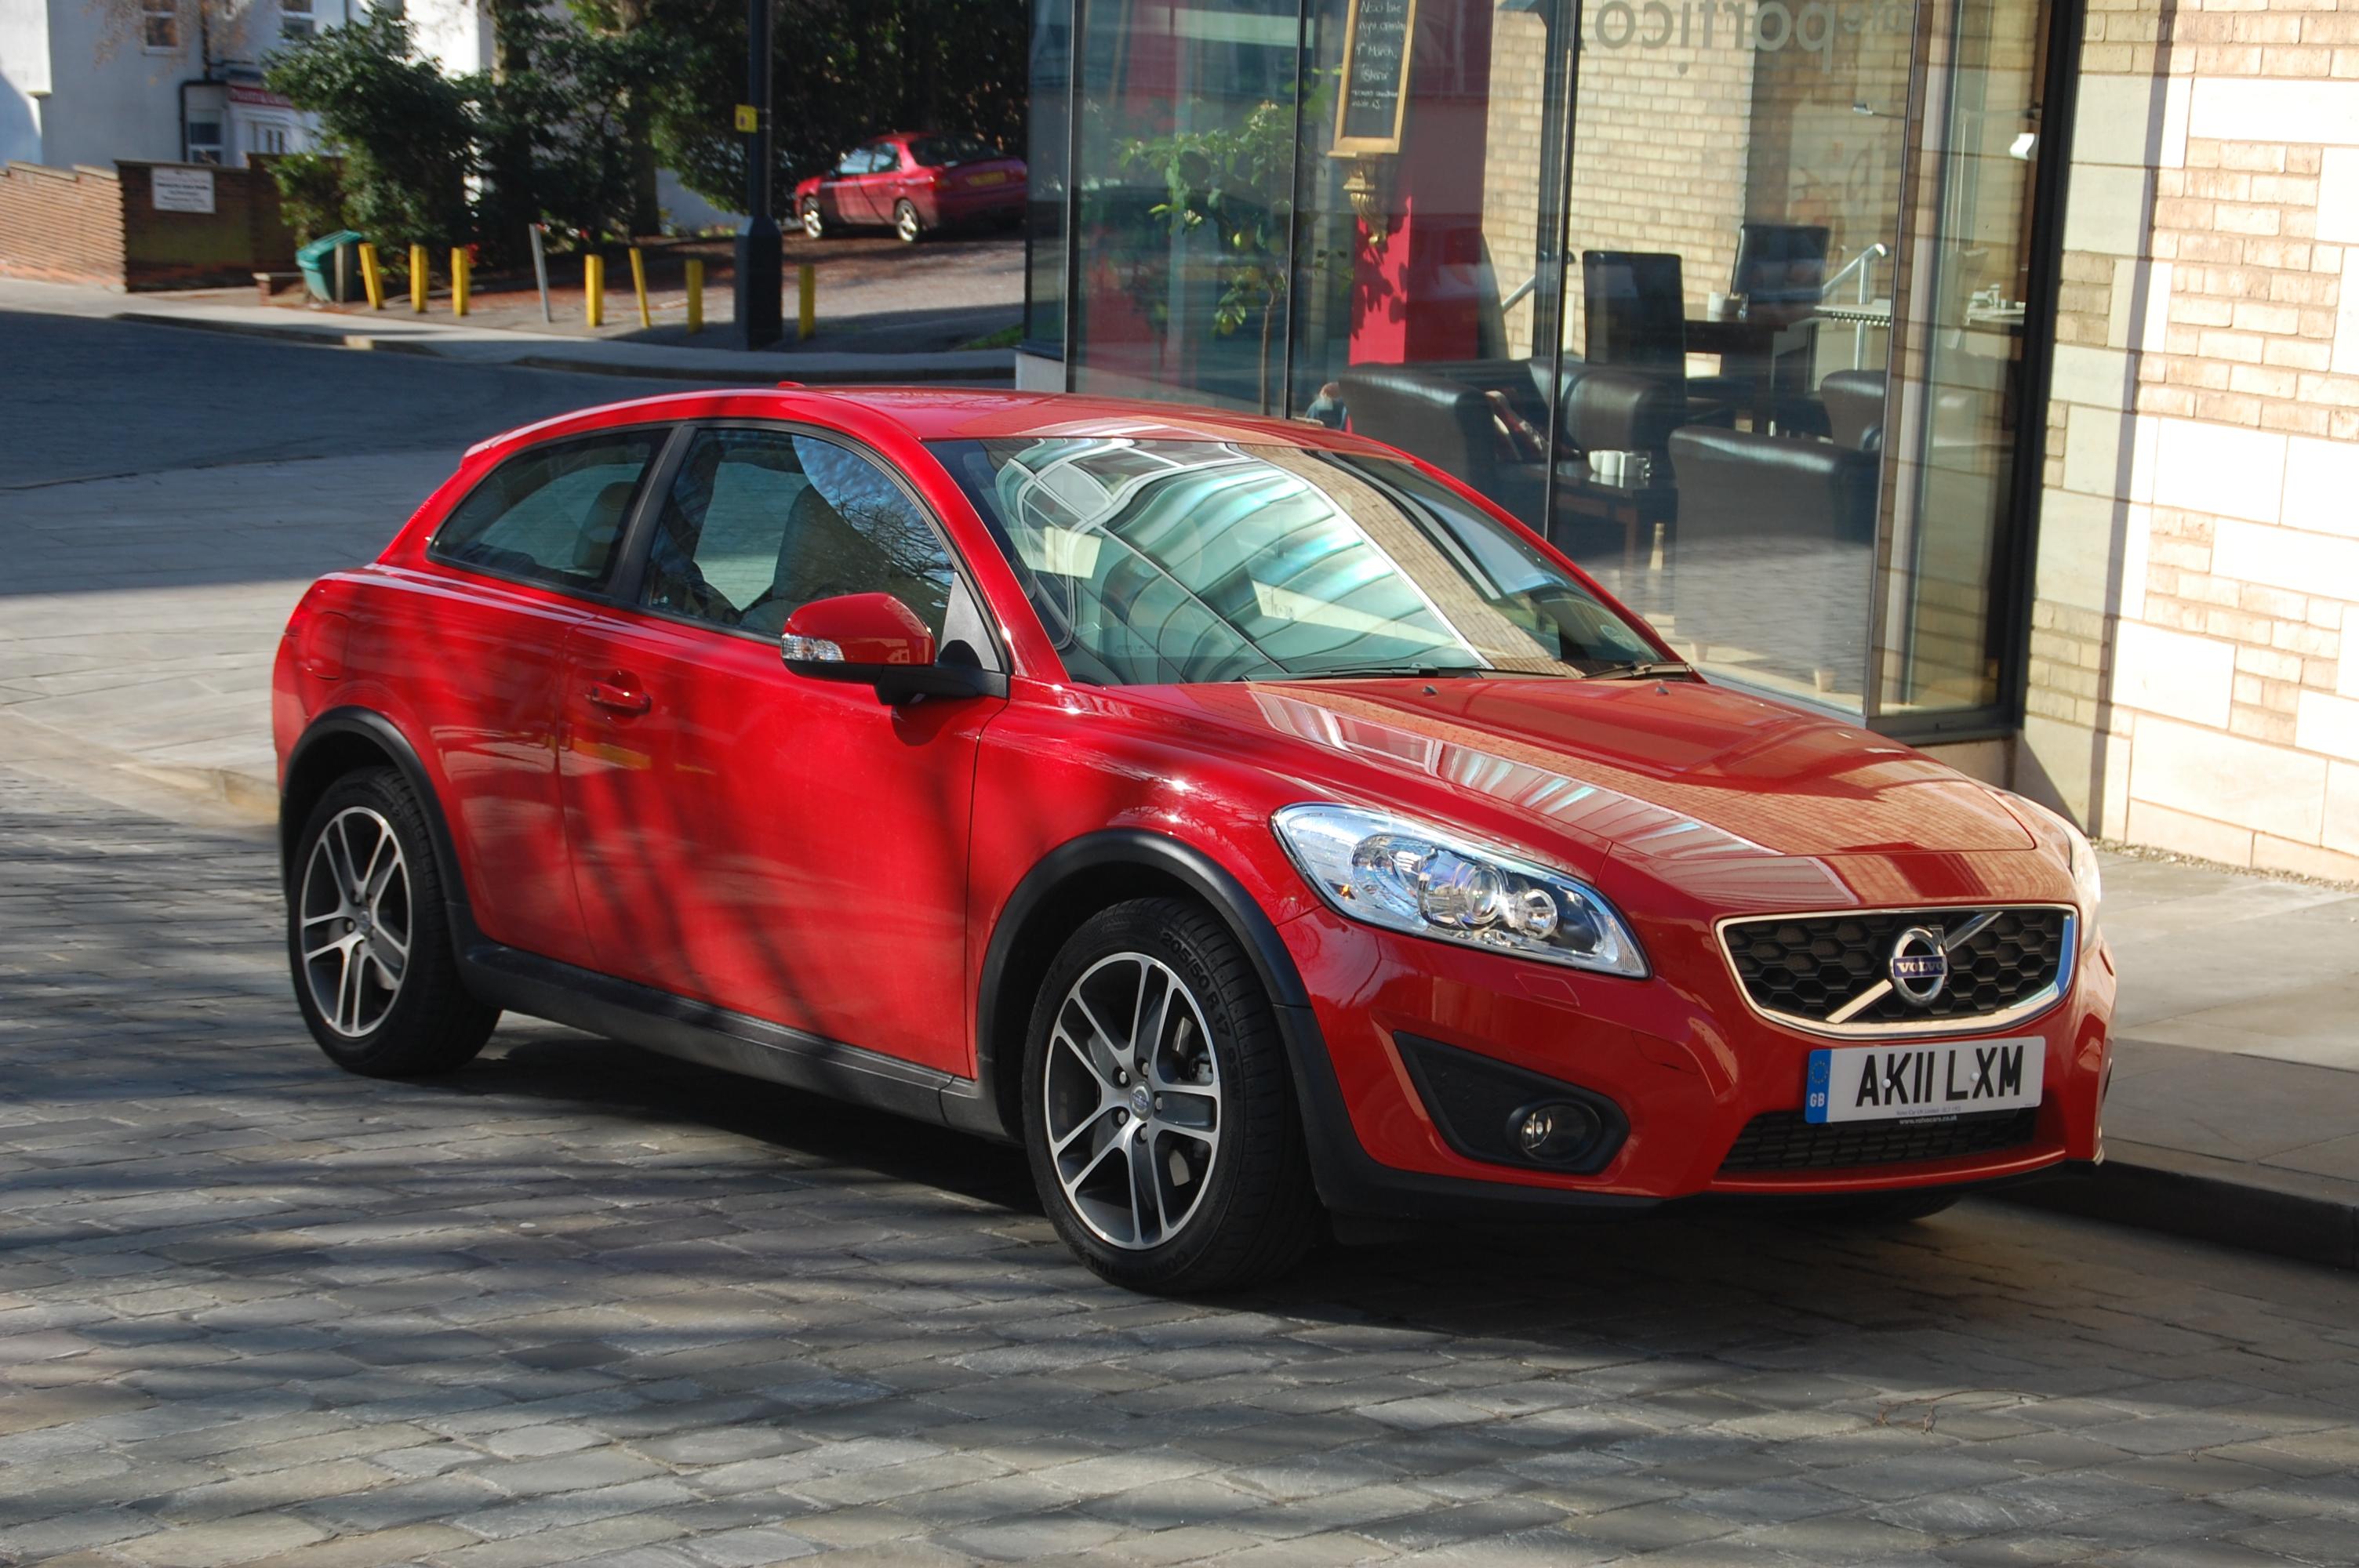 Volvo C30 DRIVe SE Lux Start/Stop Road Test « Petroleum Vitae